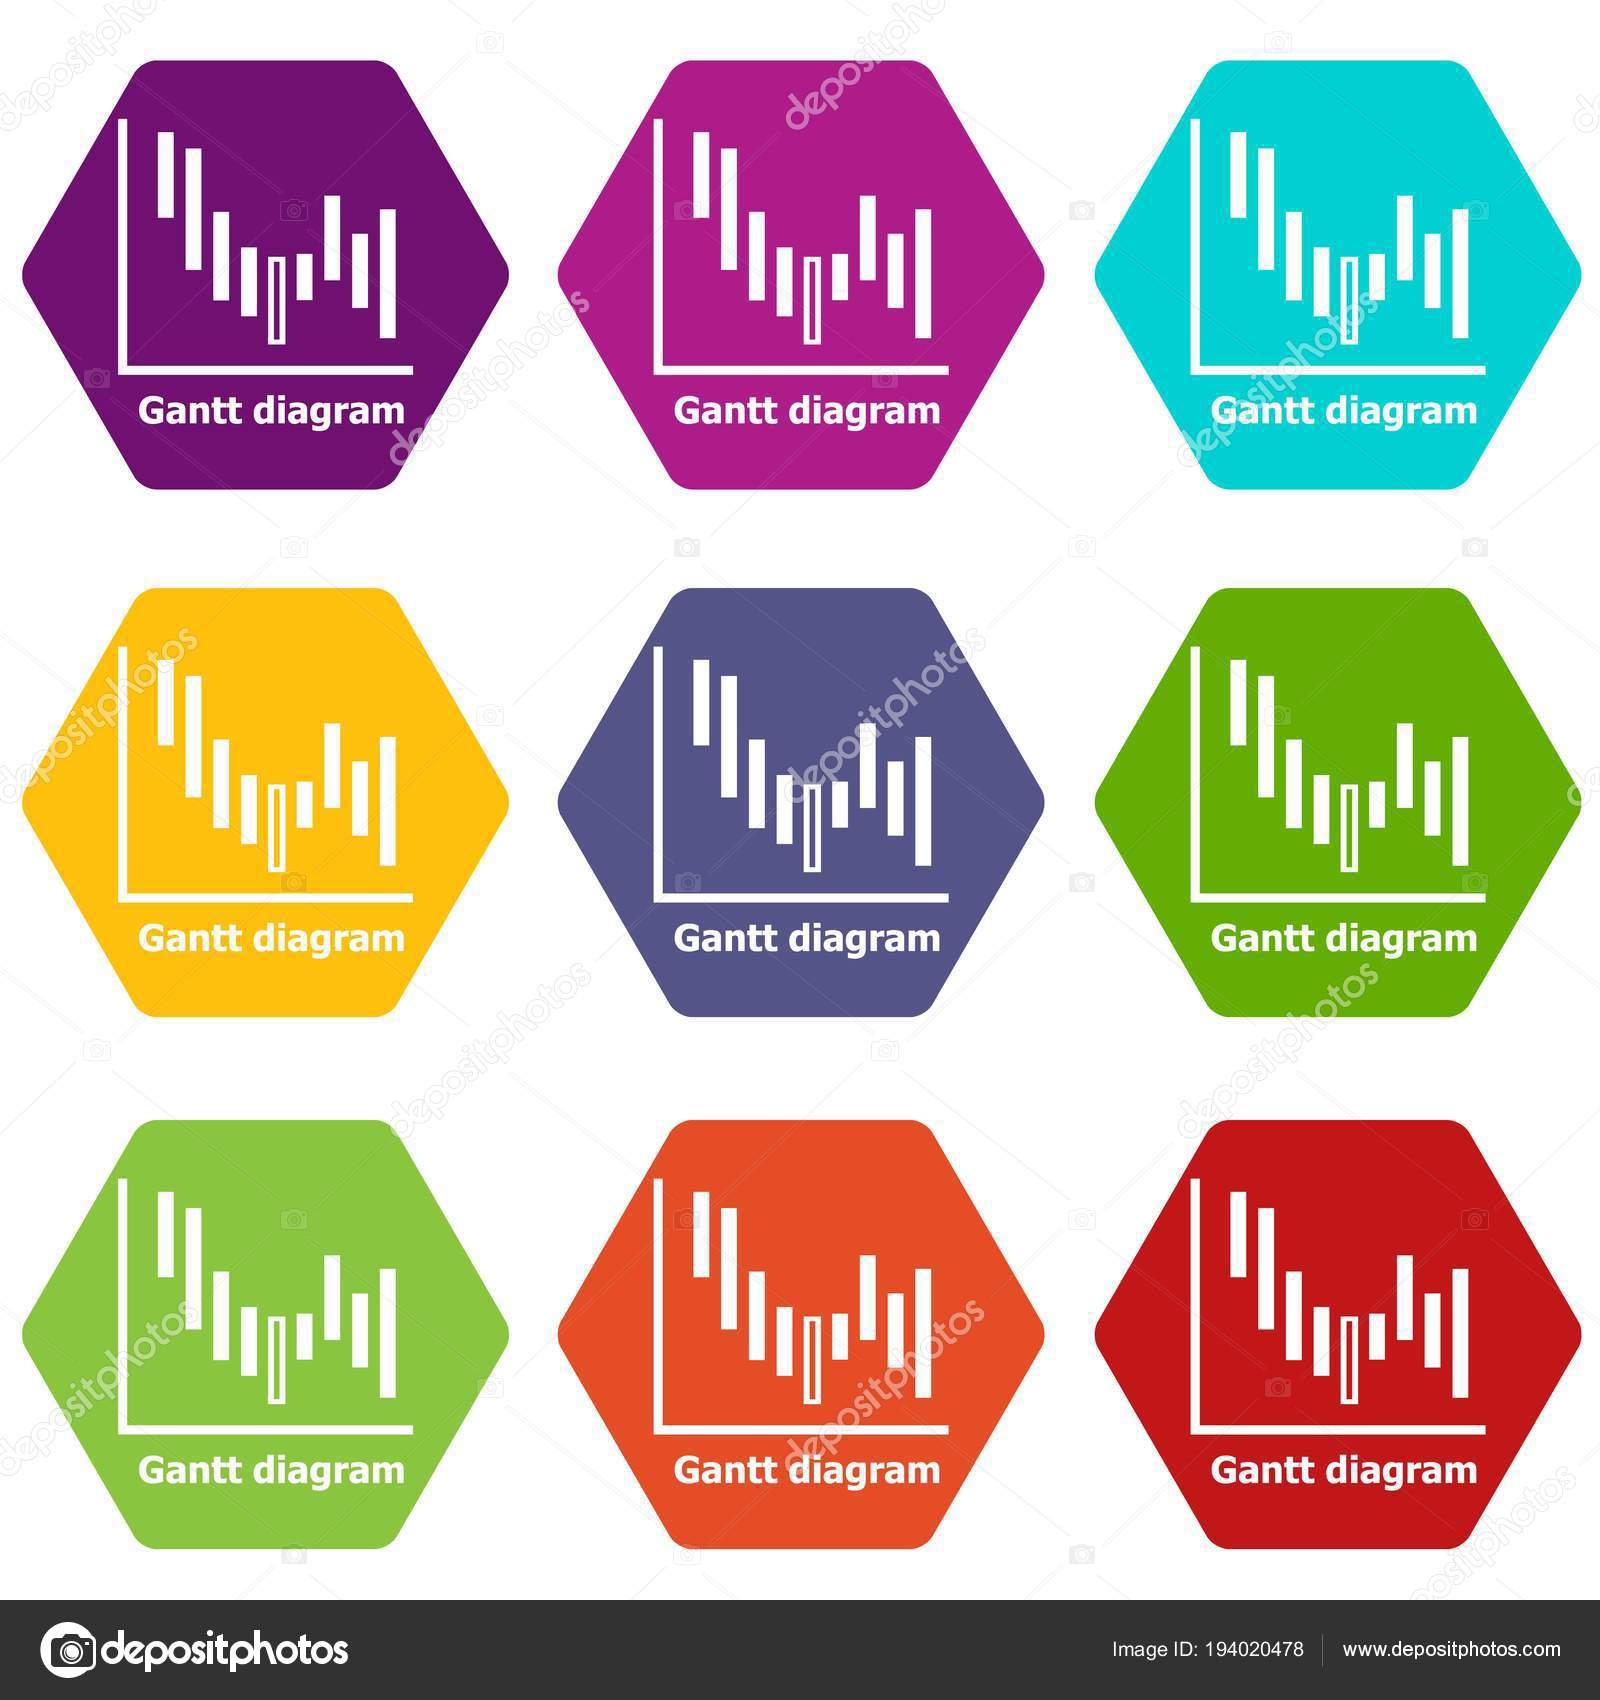 Gantt diagram icons set 9 vector stock vector ylivdesign 194020478 gantt diagram icons set 9 vector stock vector ccuart Choice Image